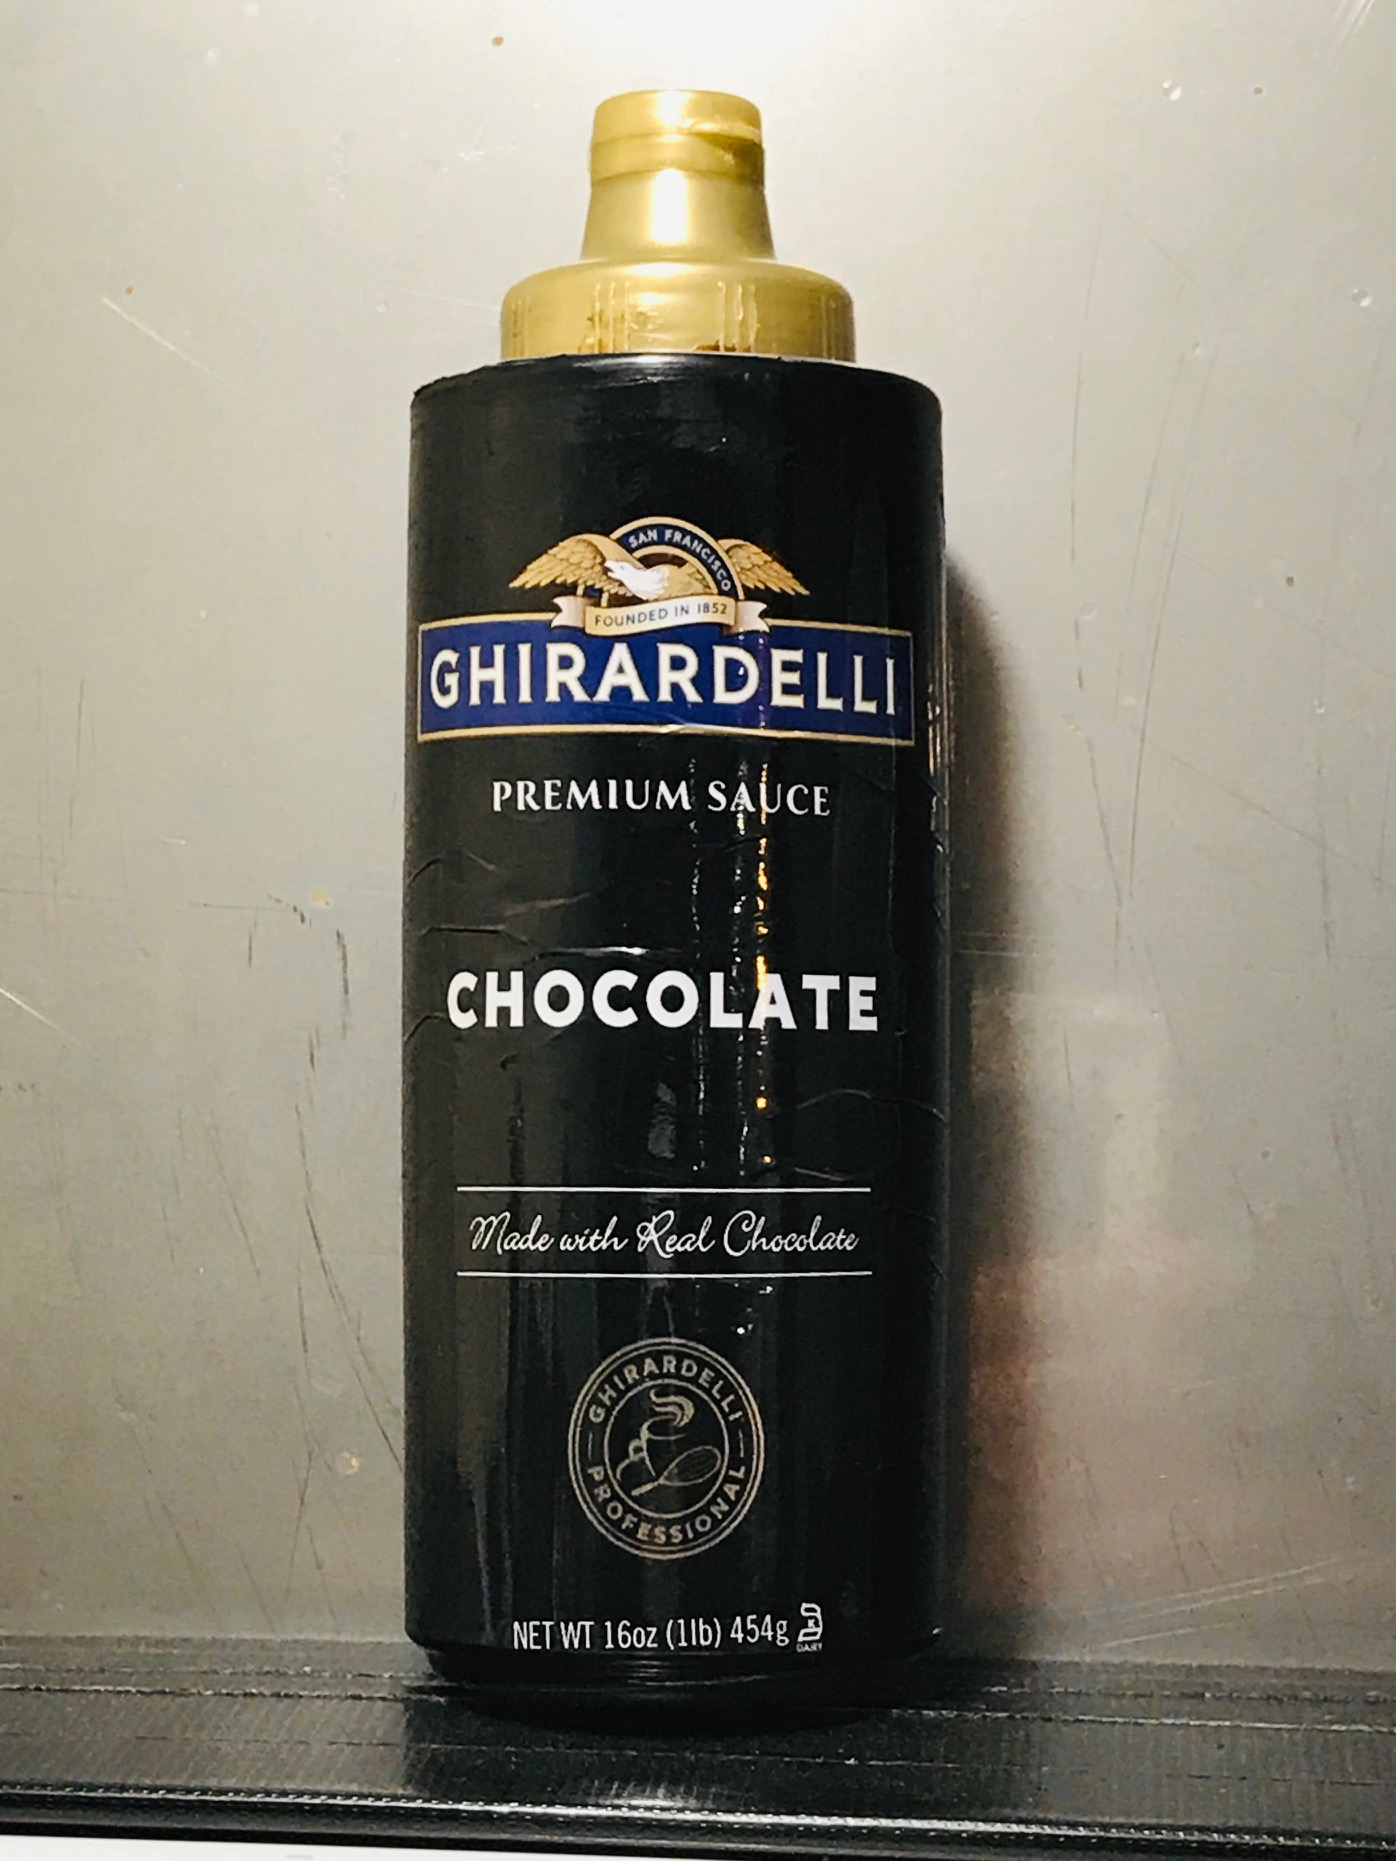 GHIRARDELLI CHOCOLATE SAUCE